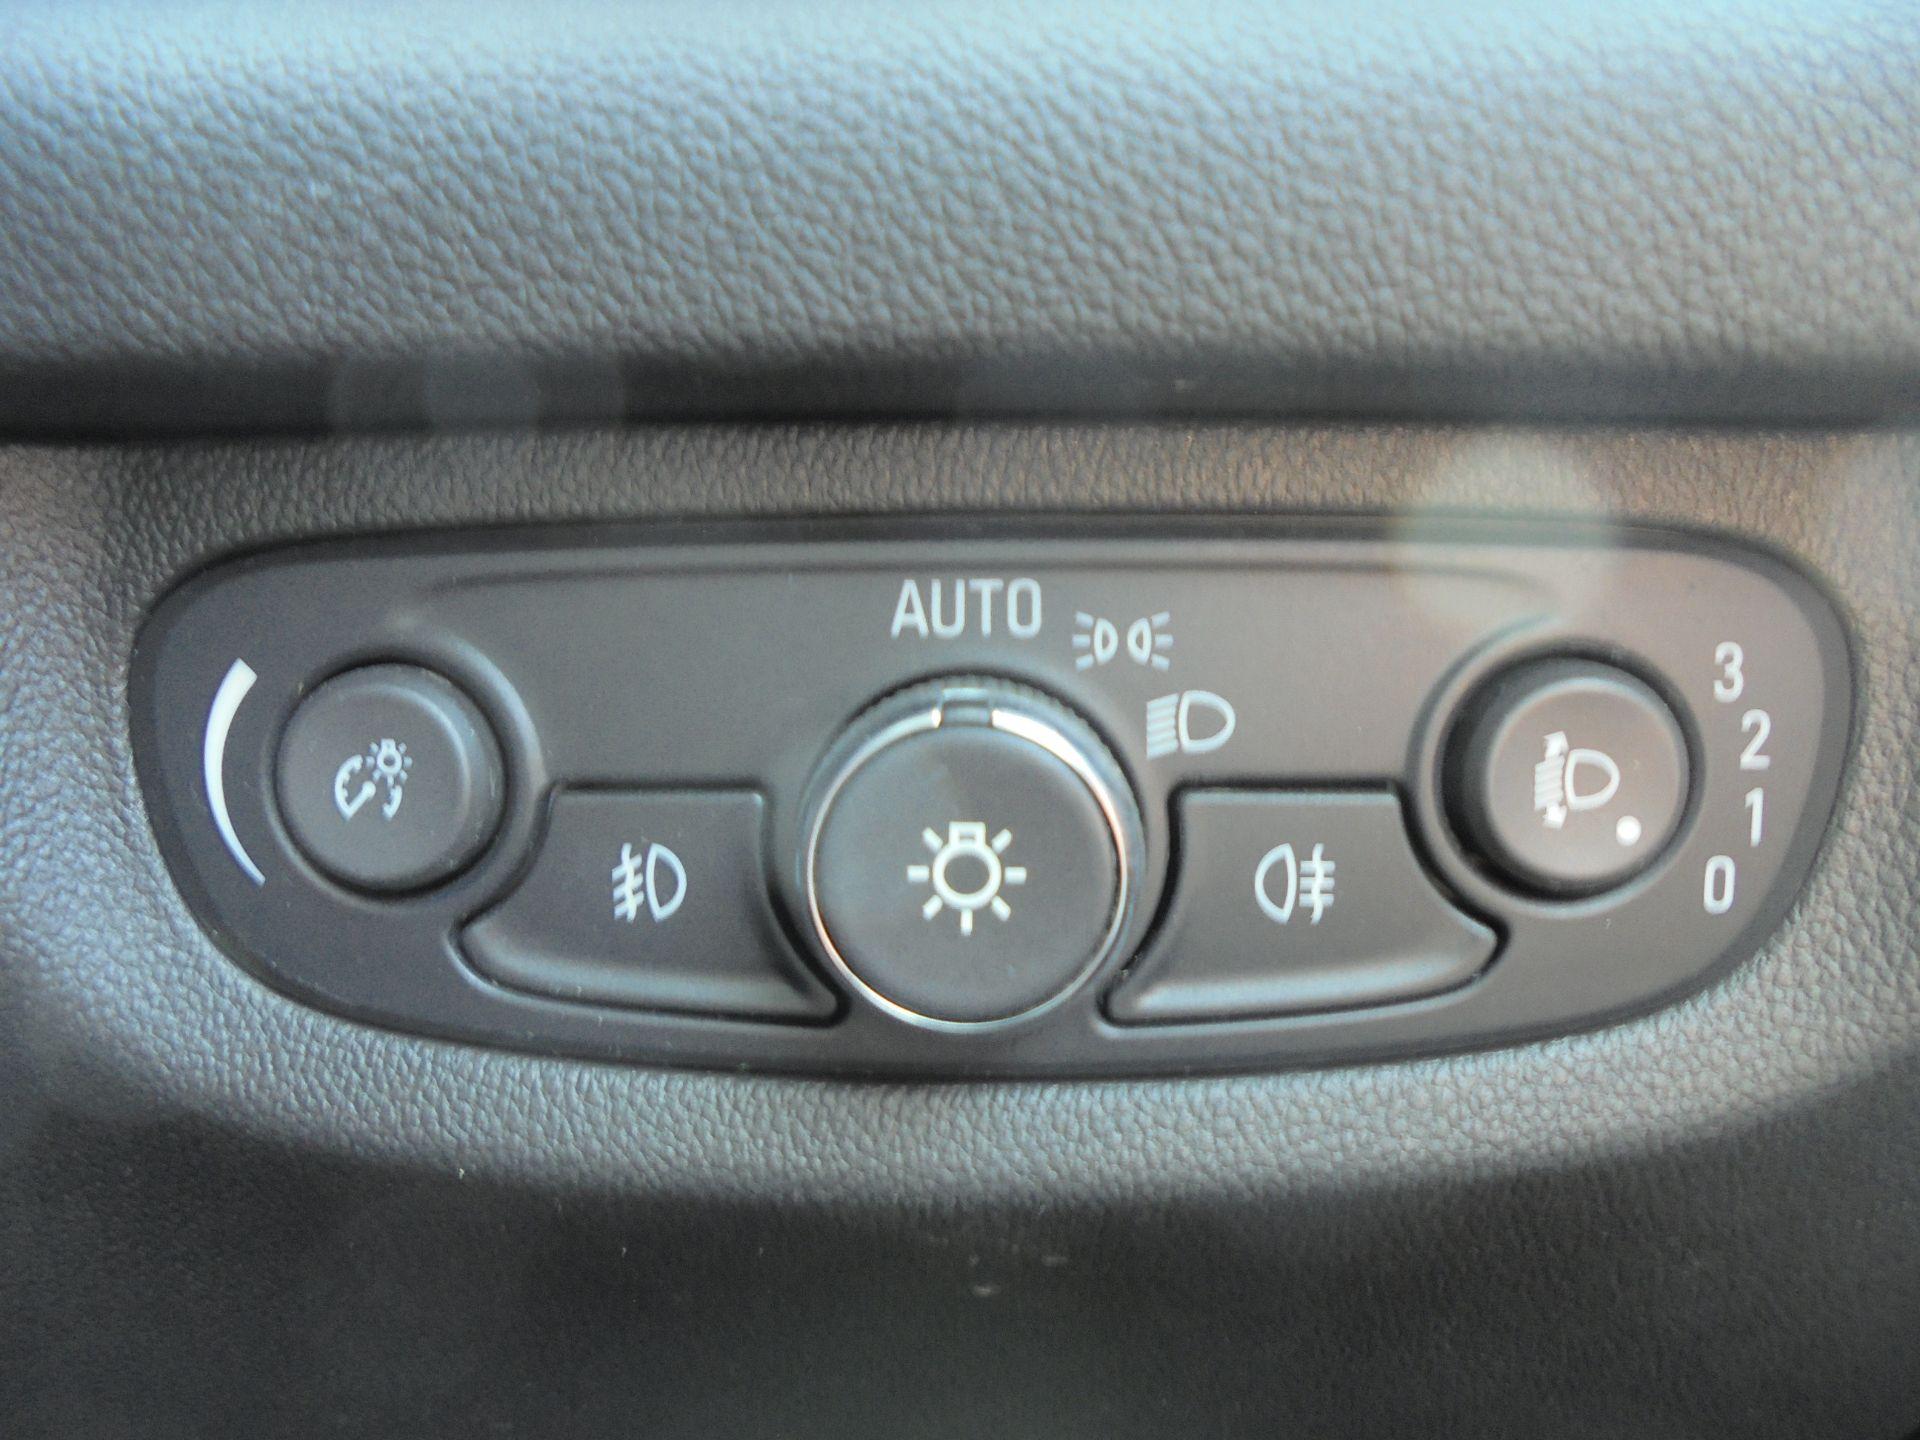 2018 Vauxhall Insignia Grand Sport 1.6 Turbo D Ecotec [136] Sri Nav 5Dr (VU18DFF) Image 16